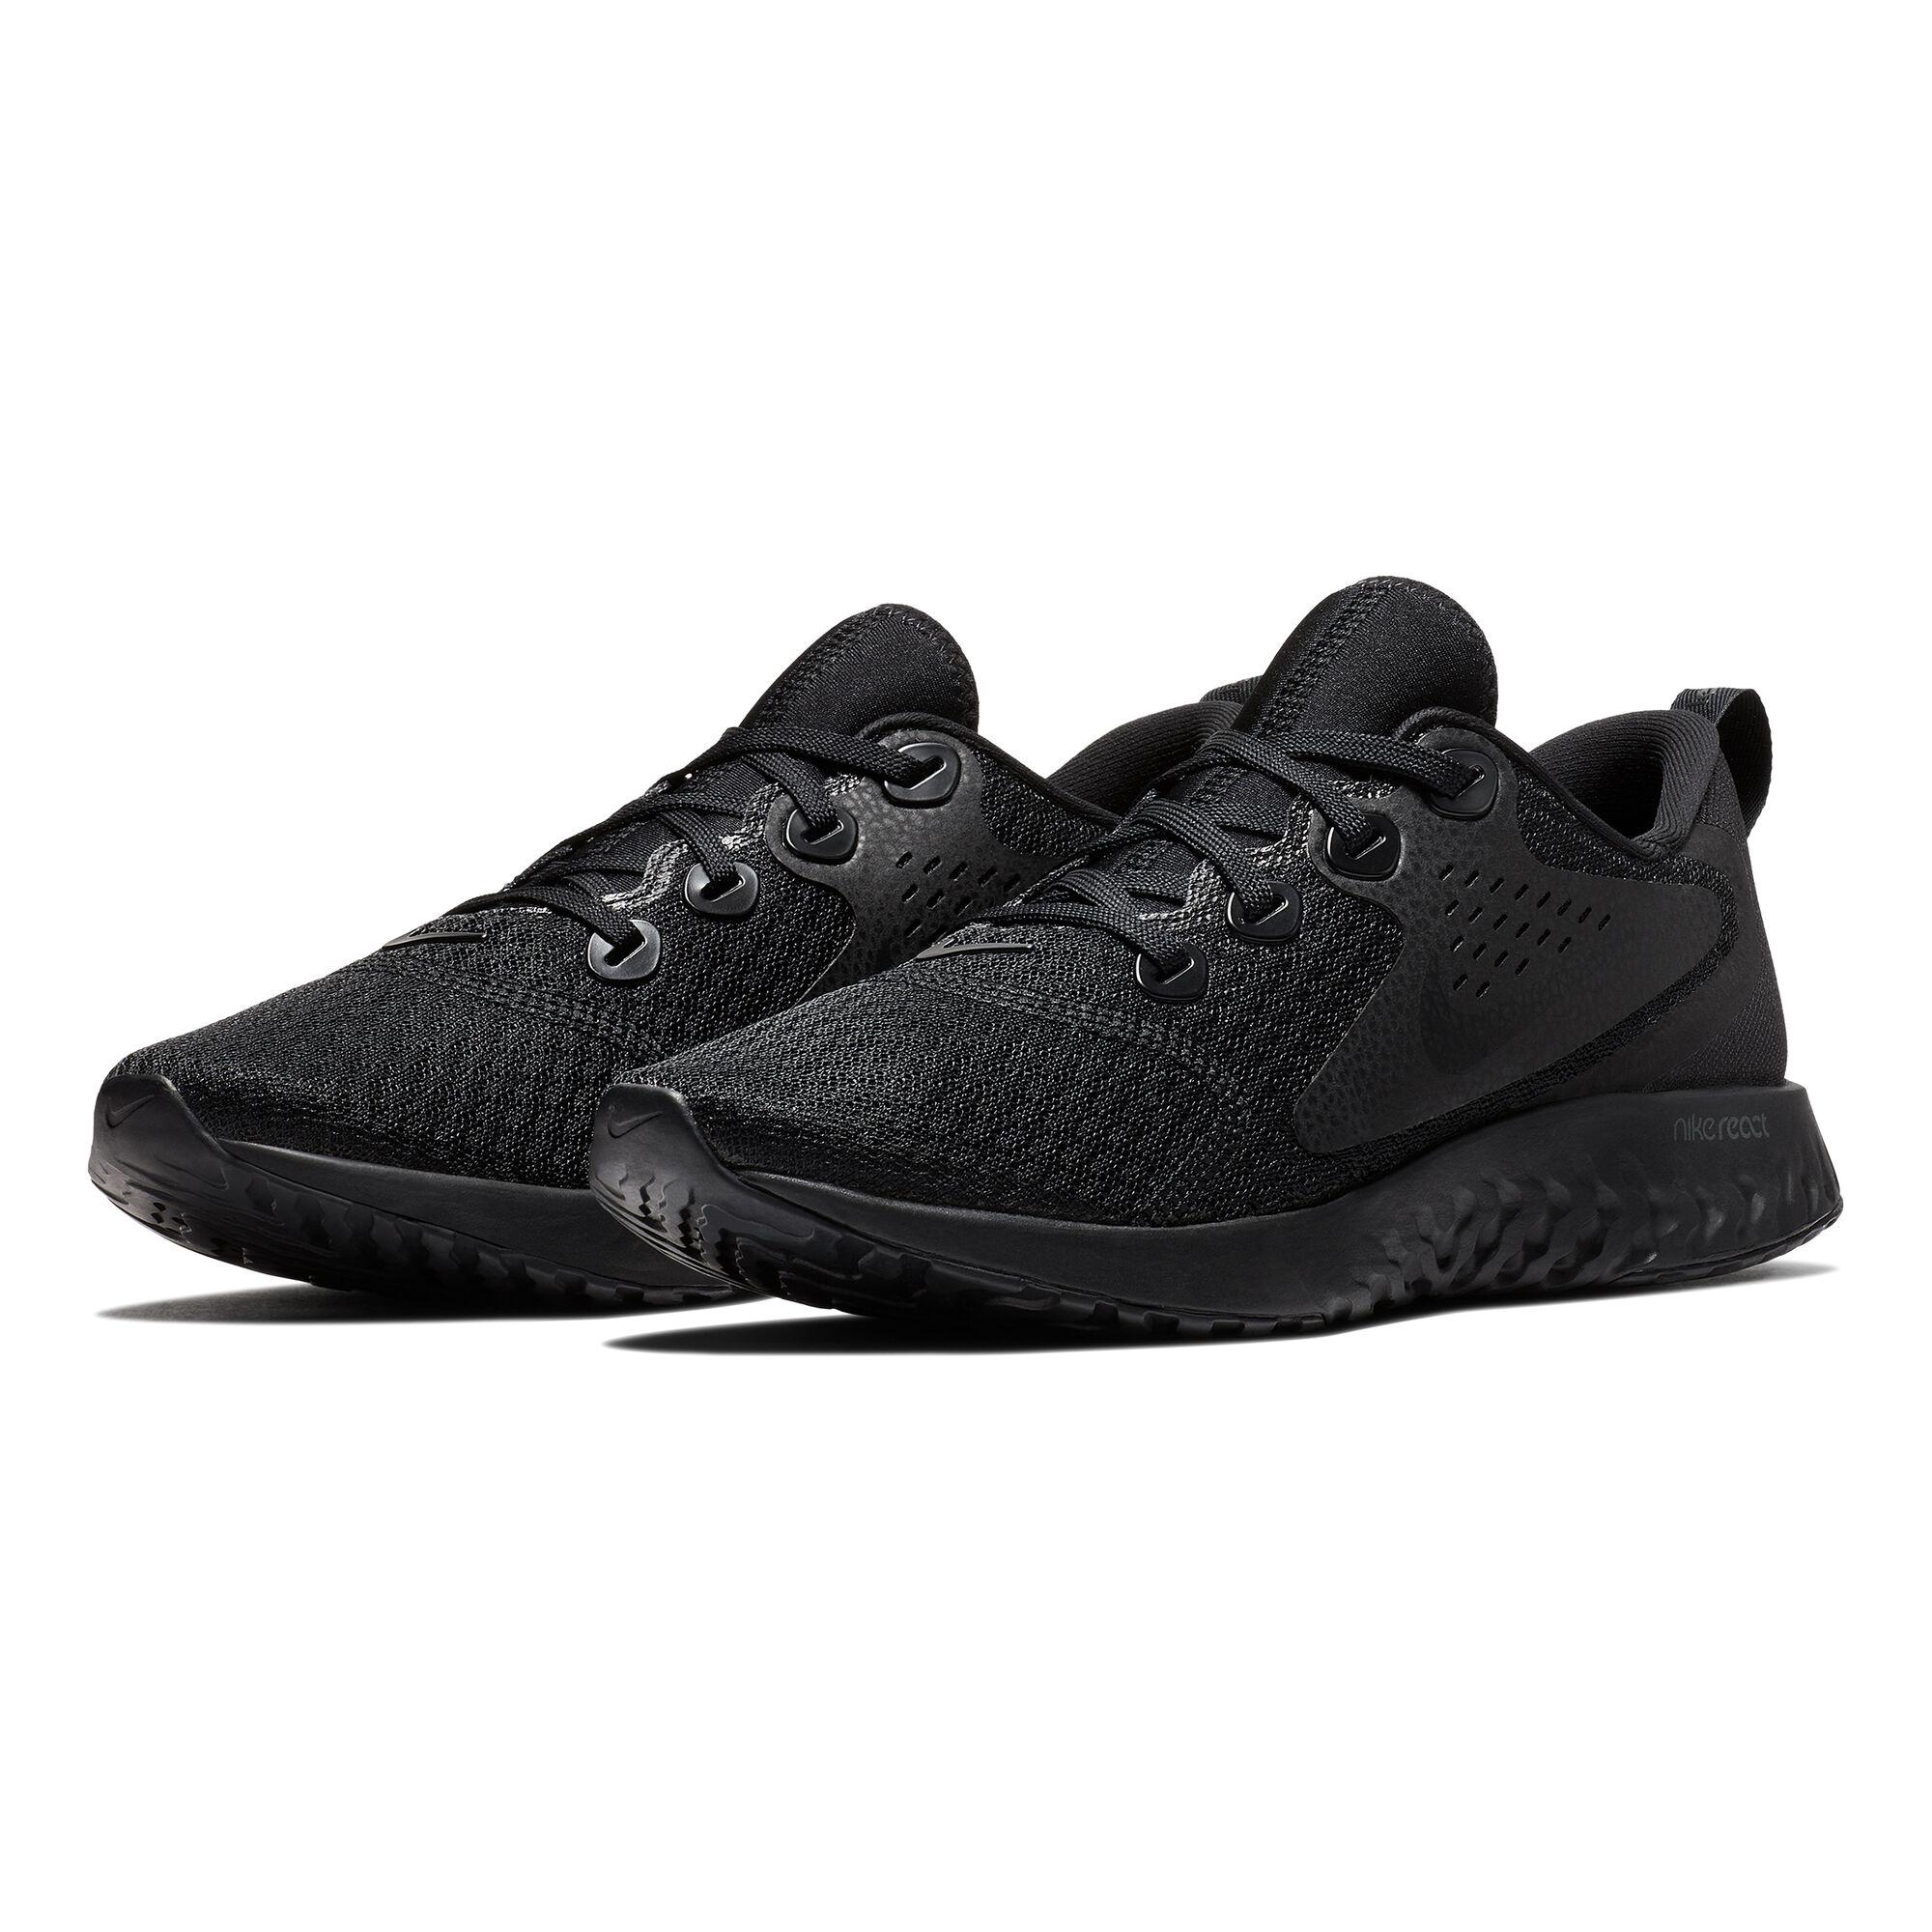 a02b806538755 buy Nike Rebel React Neutral Running Shoe Women - Black